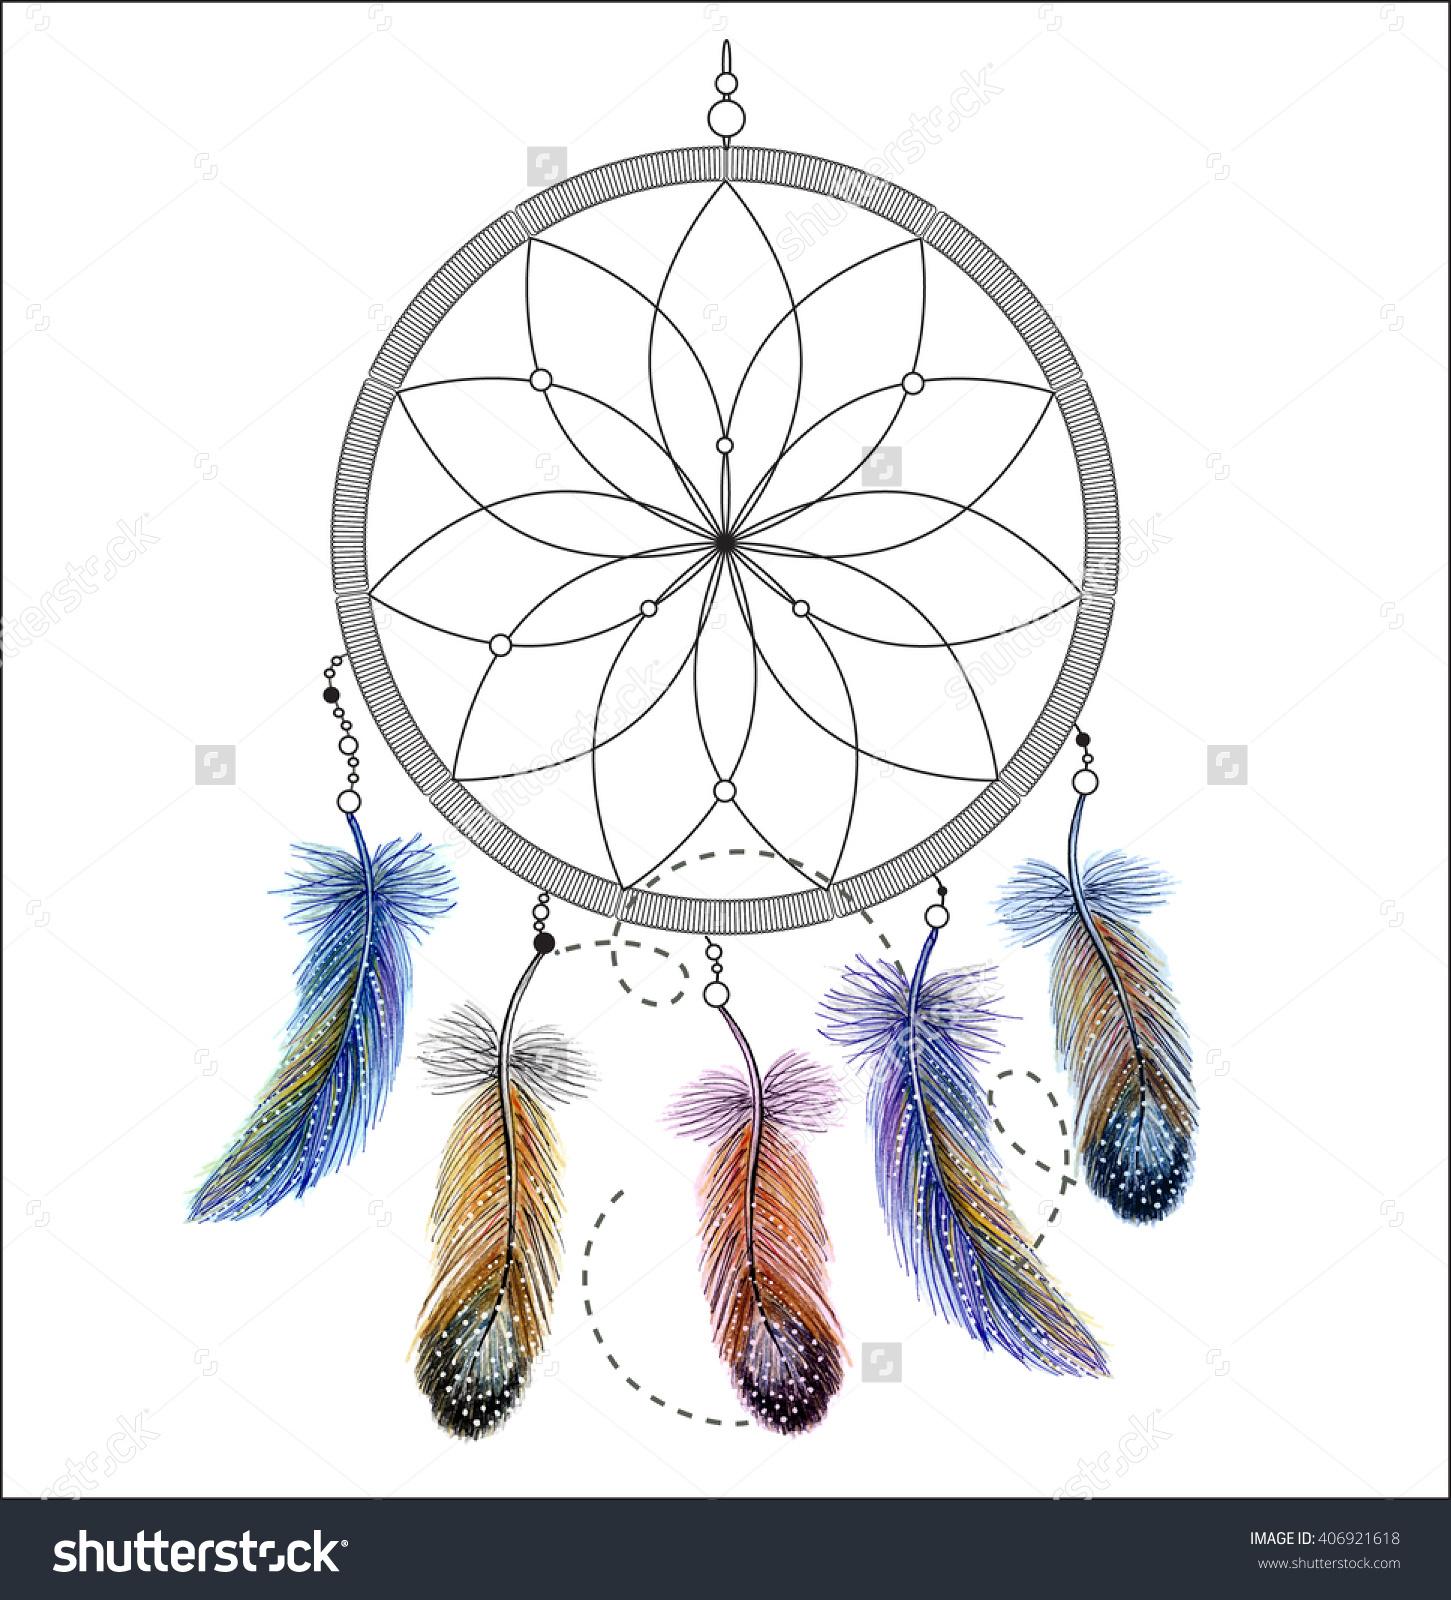 Watercolor Clip Art Native American Indian Stock Illustration.